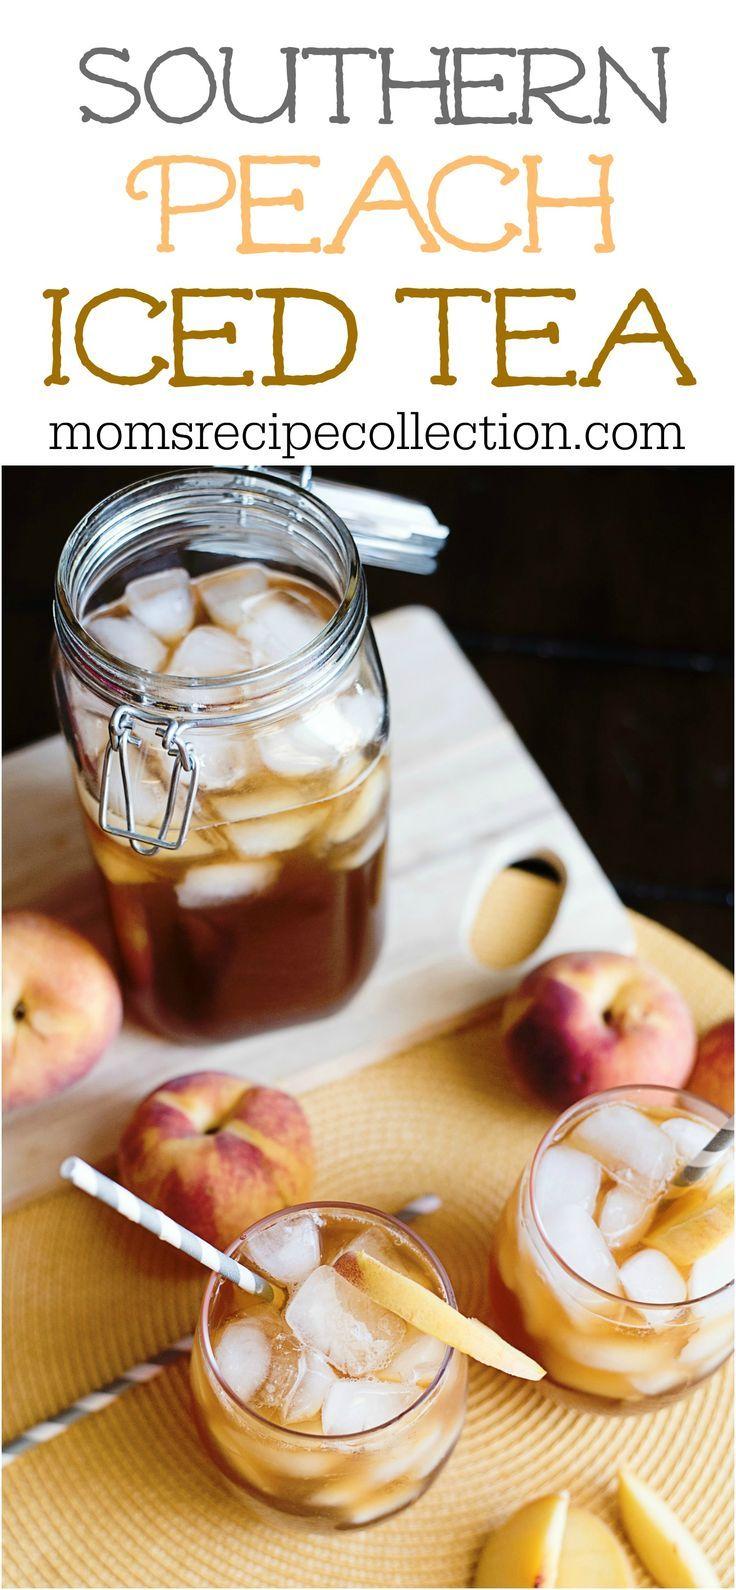 Southern peach iced tea recipe moms recipe collection soul food southern peach iced tea recipe moms recipe collection forumfinder Images